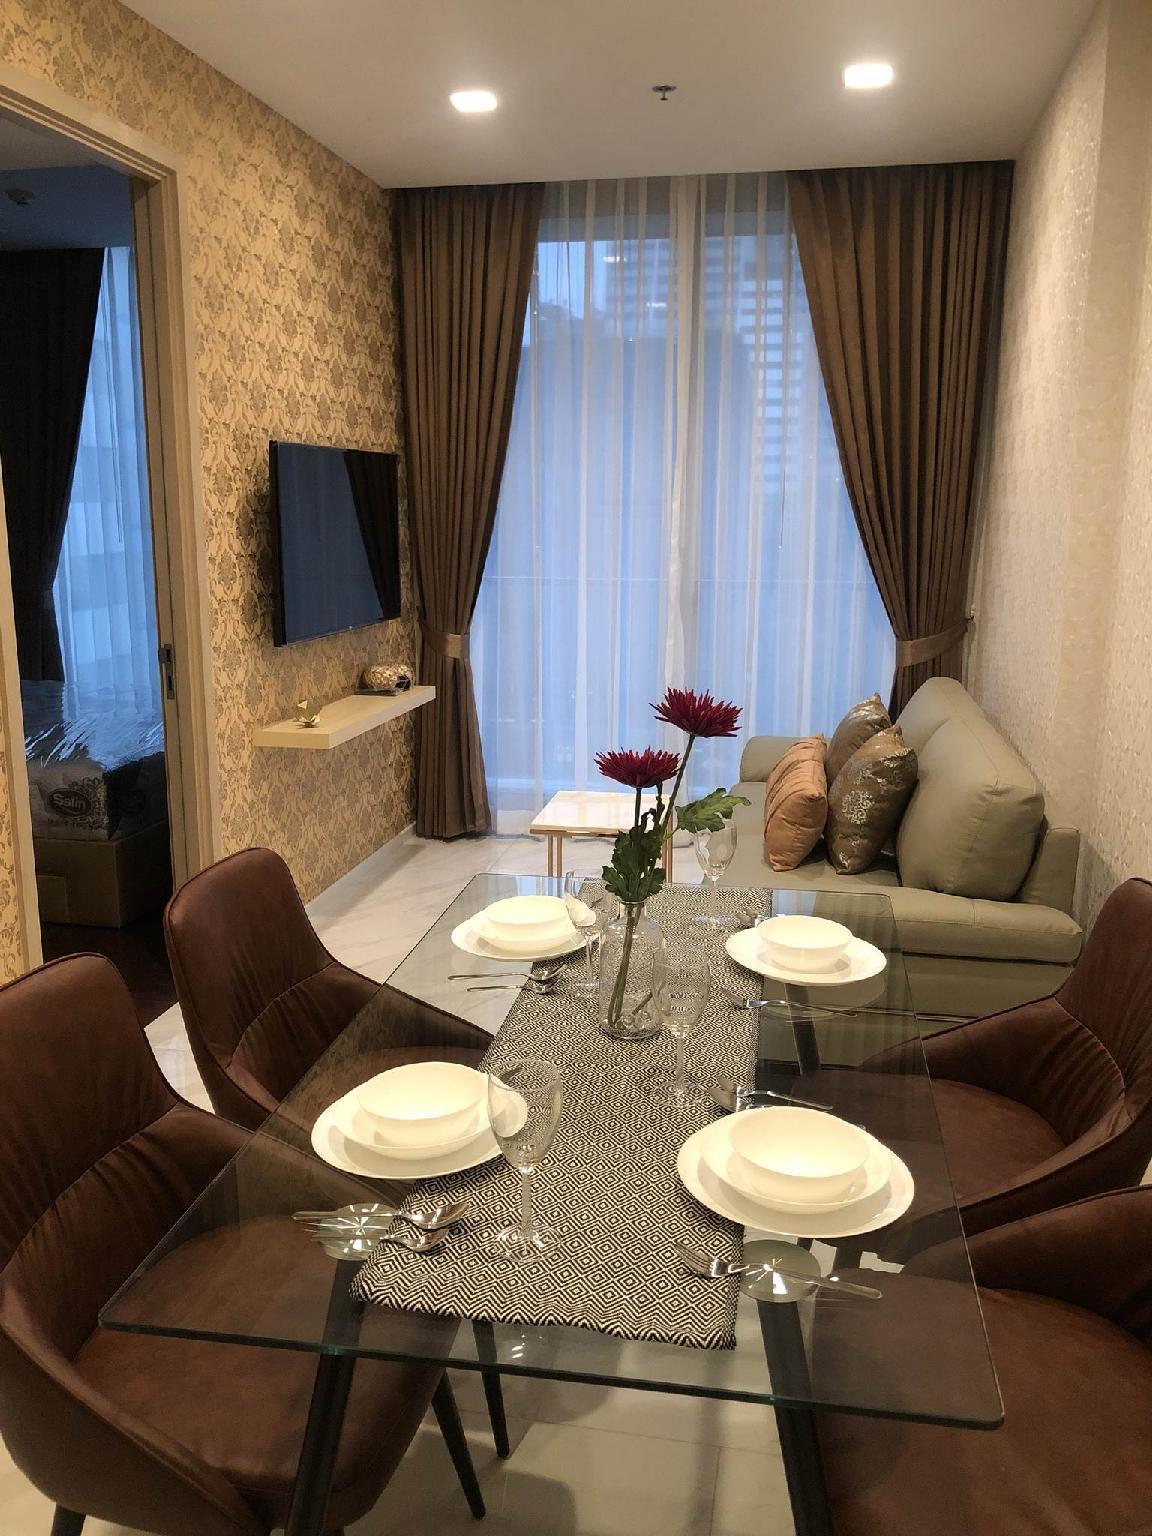 Luxury big room 4-6 pax@ Nana* MBK * Central world อพาร์ตเมนต์ 2 ห้องนอน 2 ห้องน้ำส่วนตัว ขนาด 60 ตร.ม. – สุขุมวิท